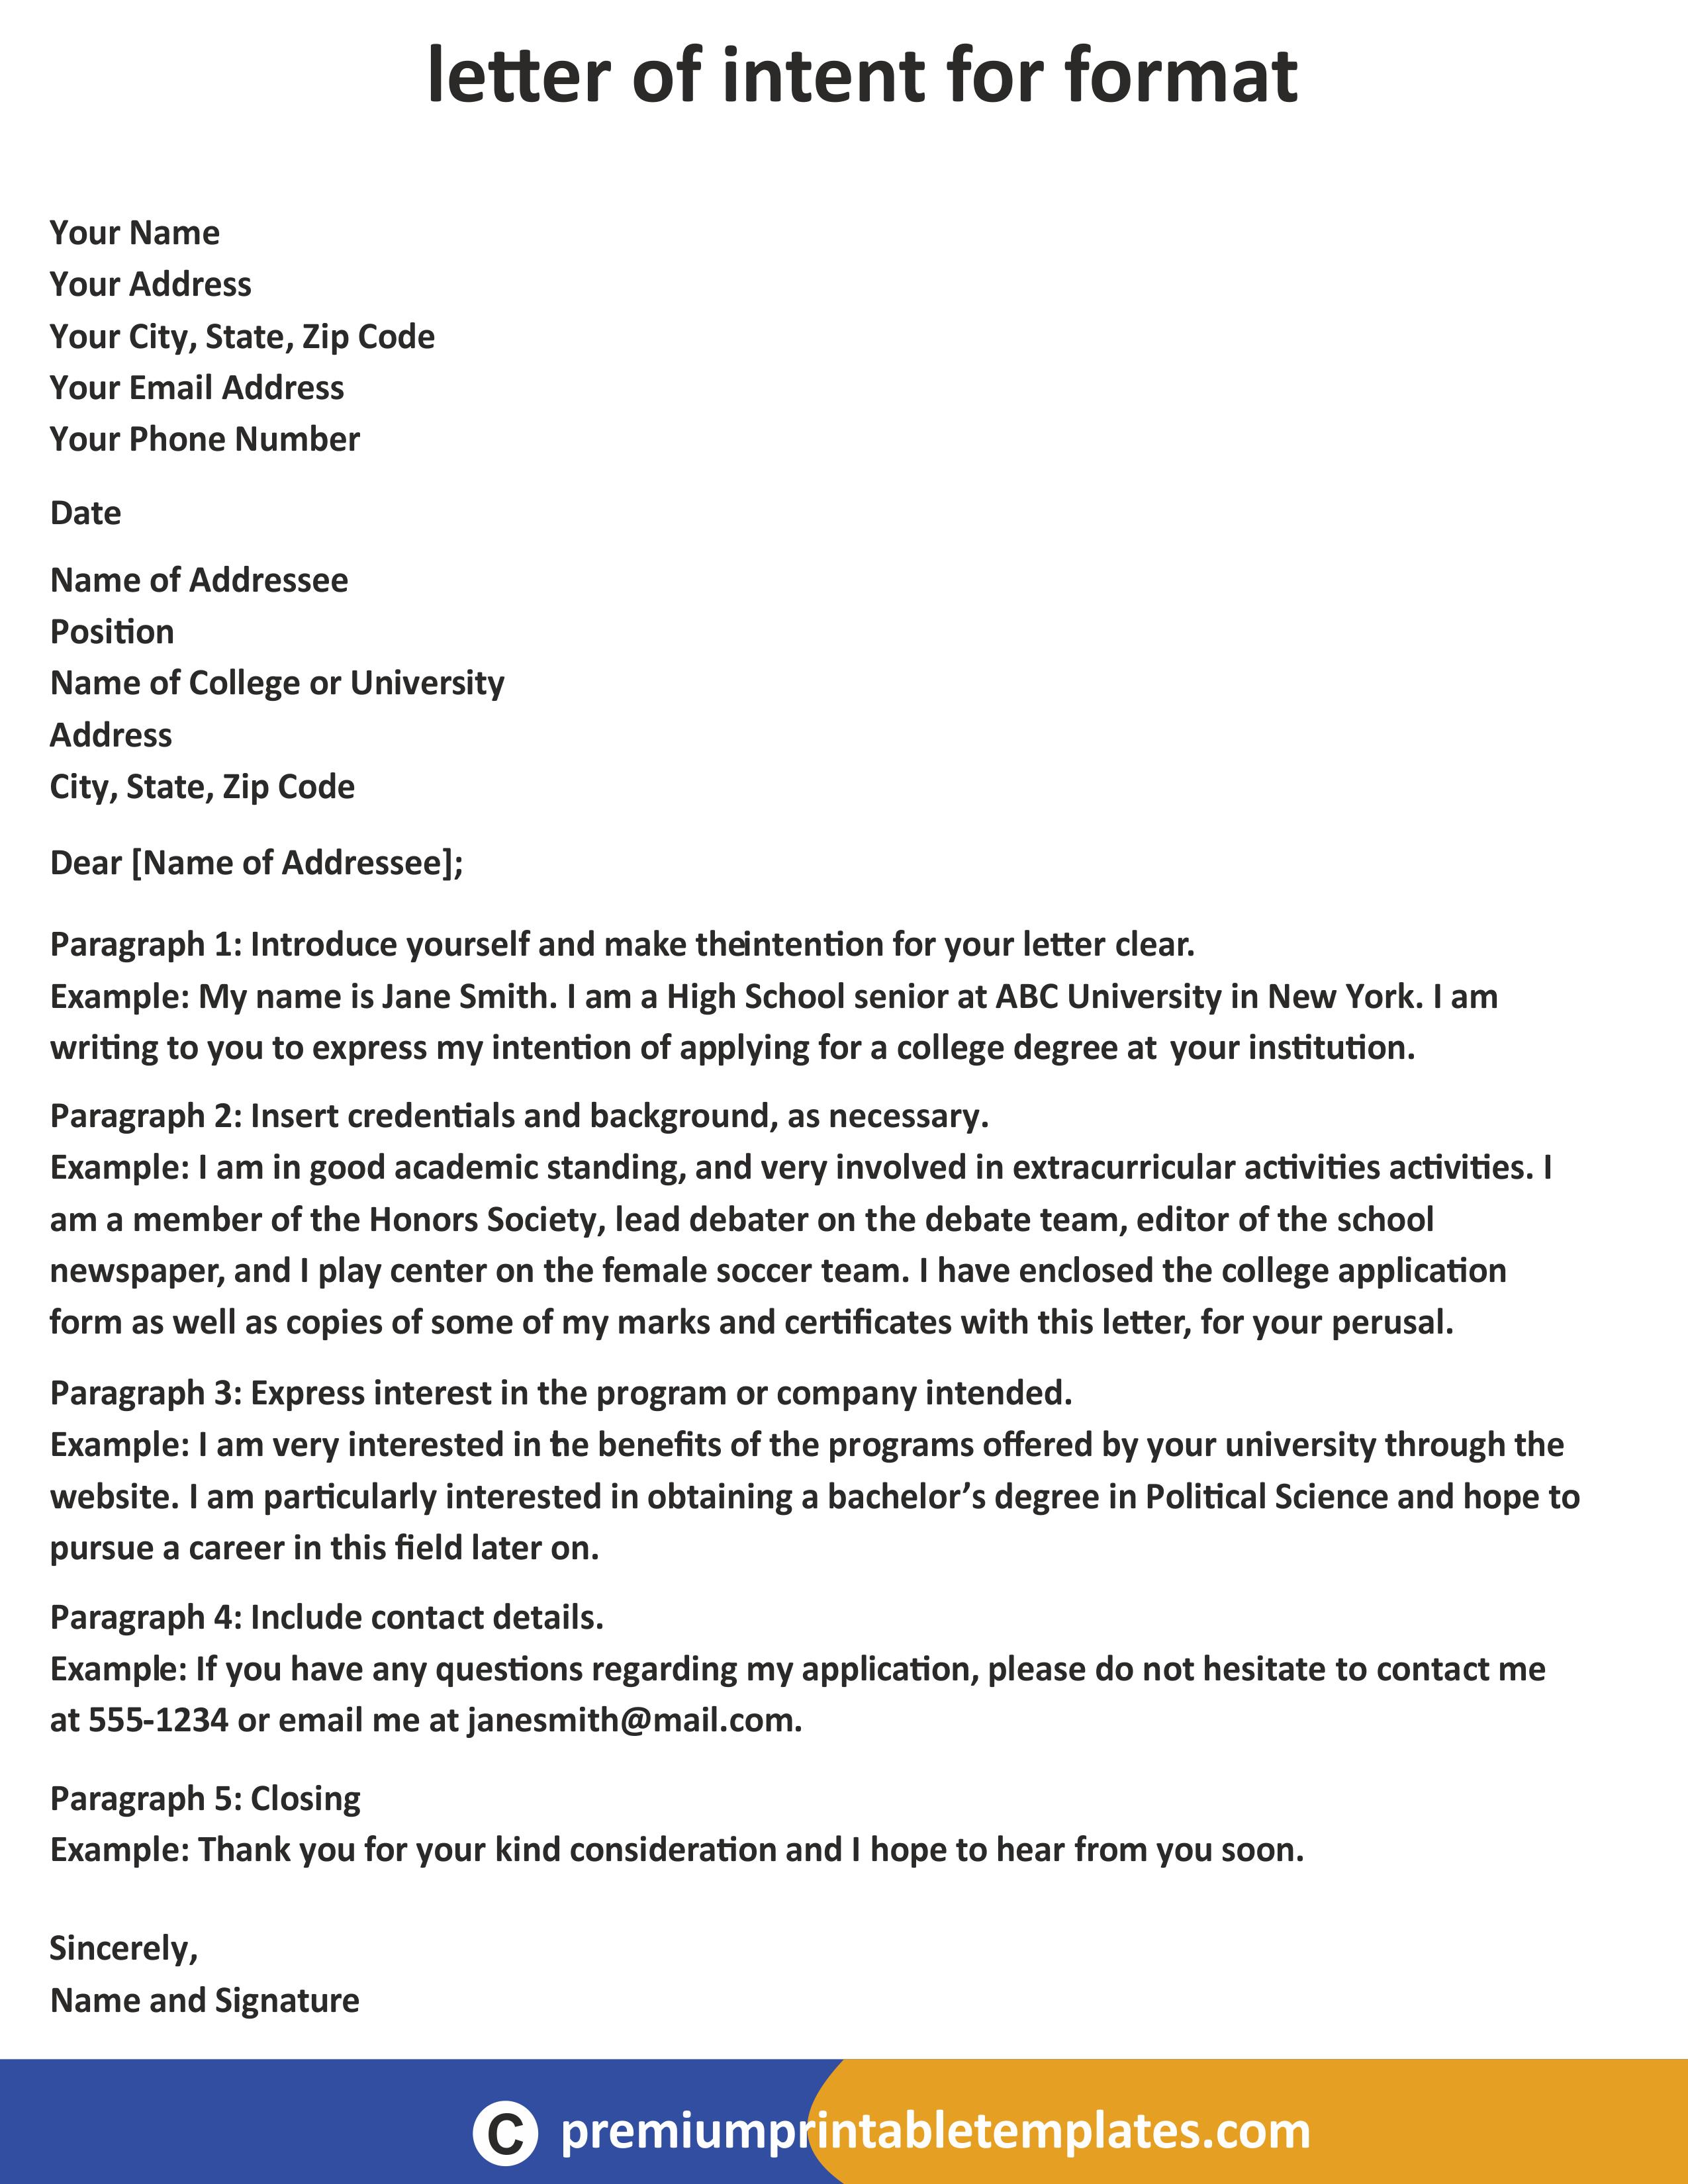 Letter of Intent Format Premium Printable Templates